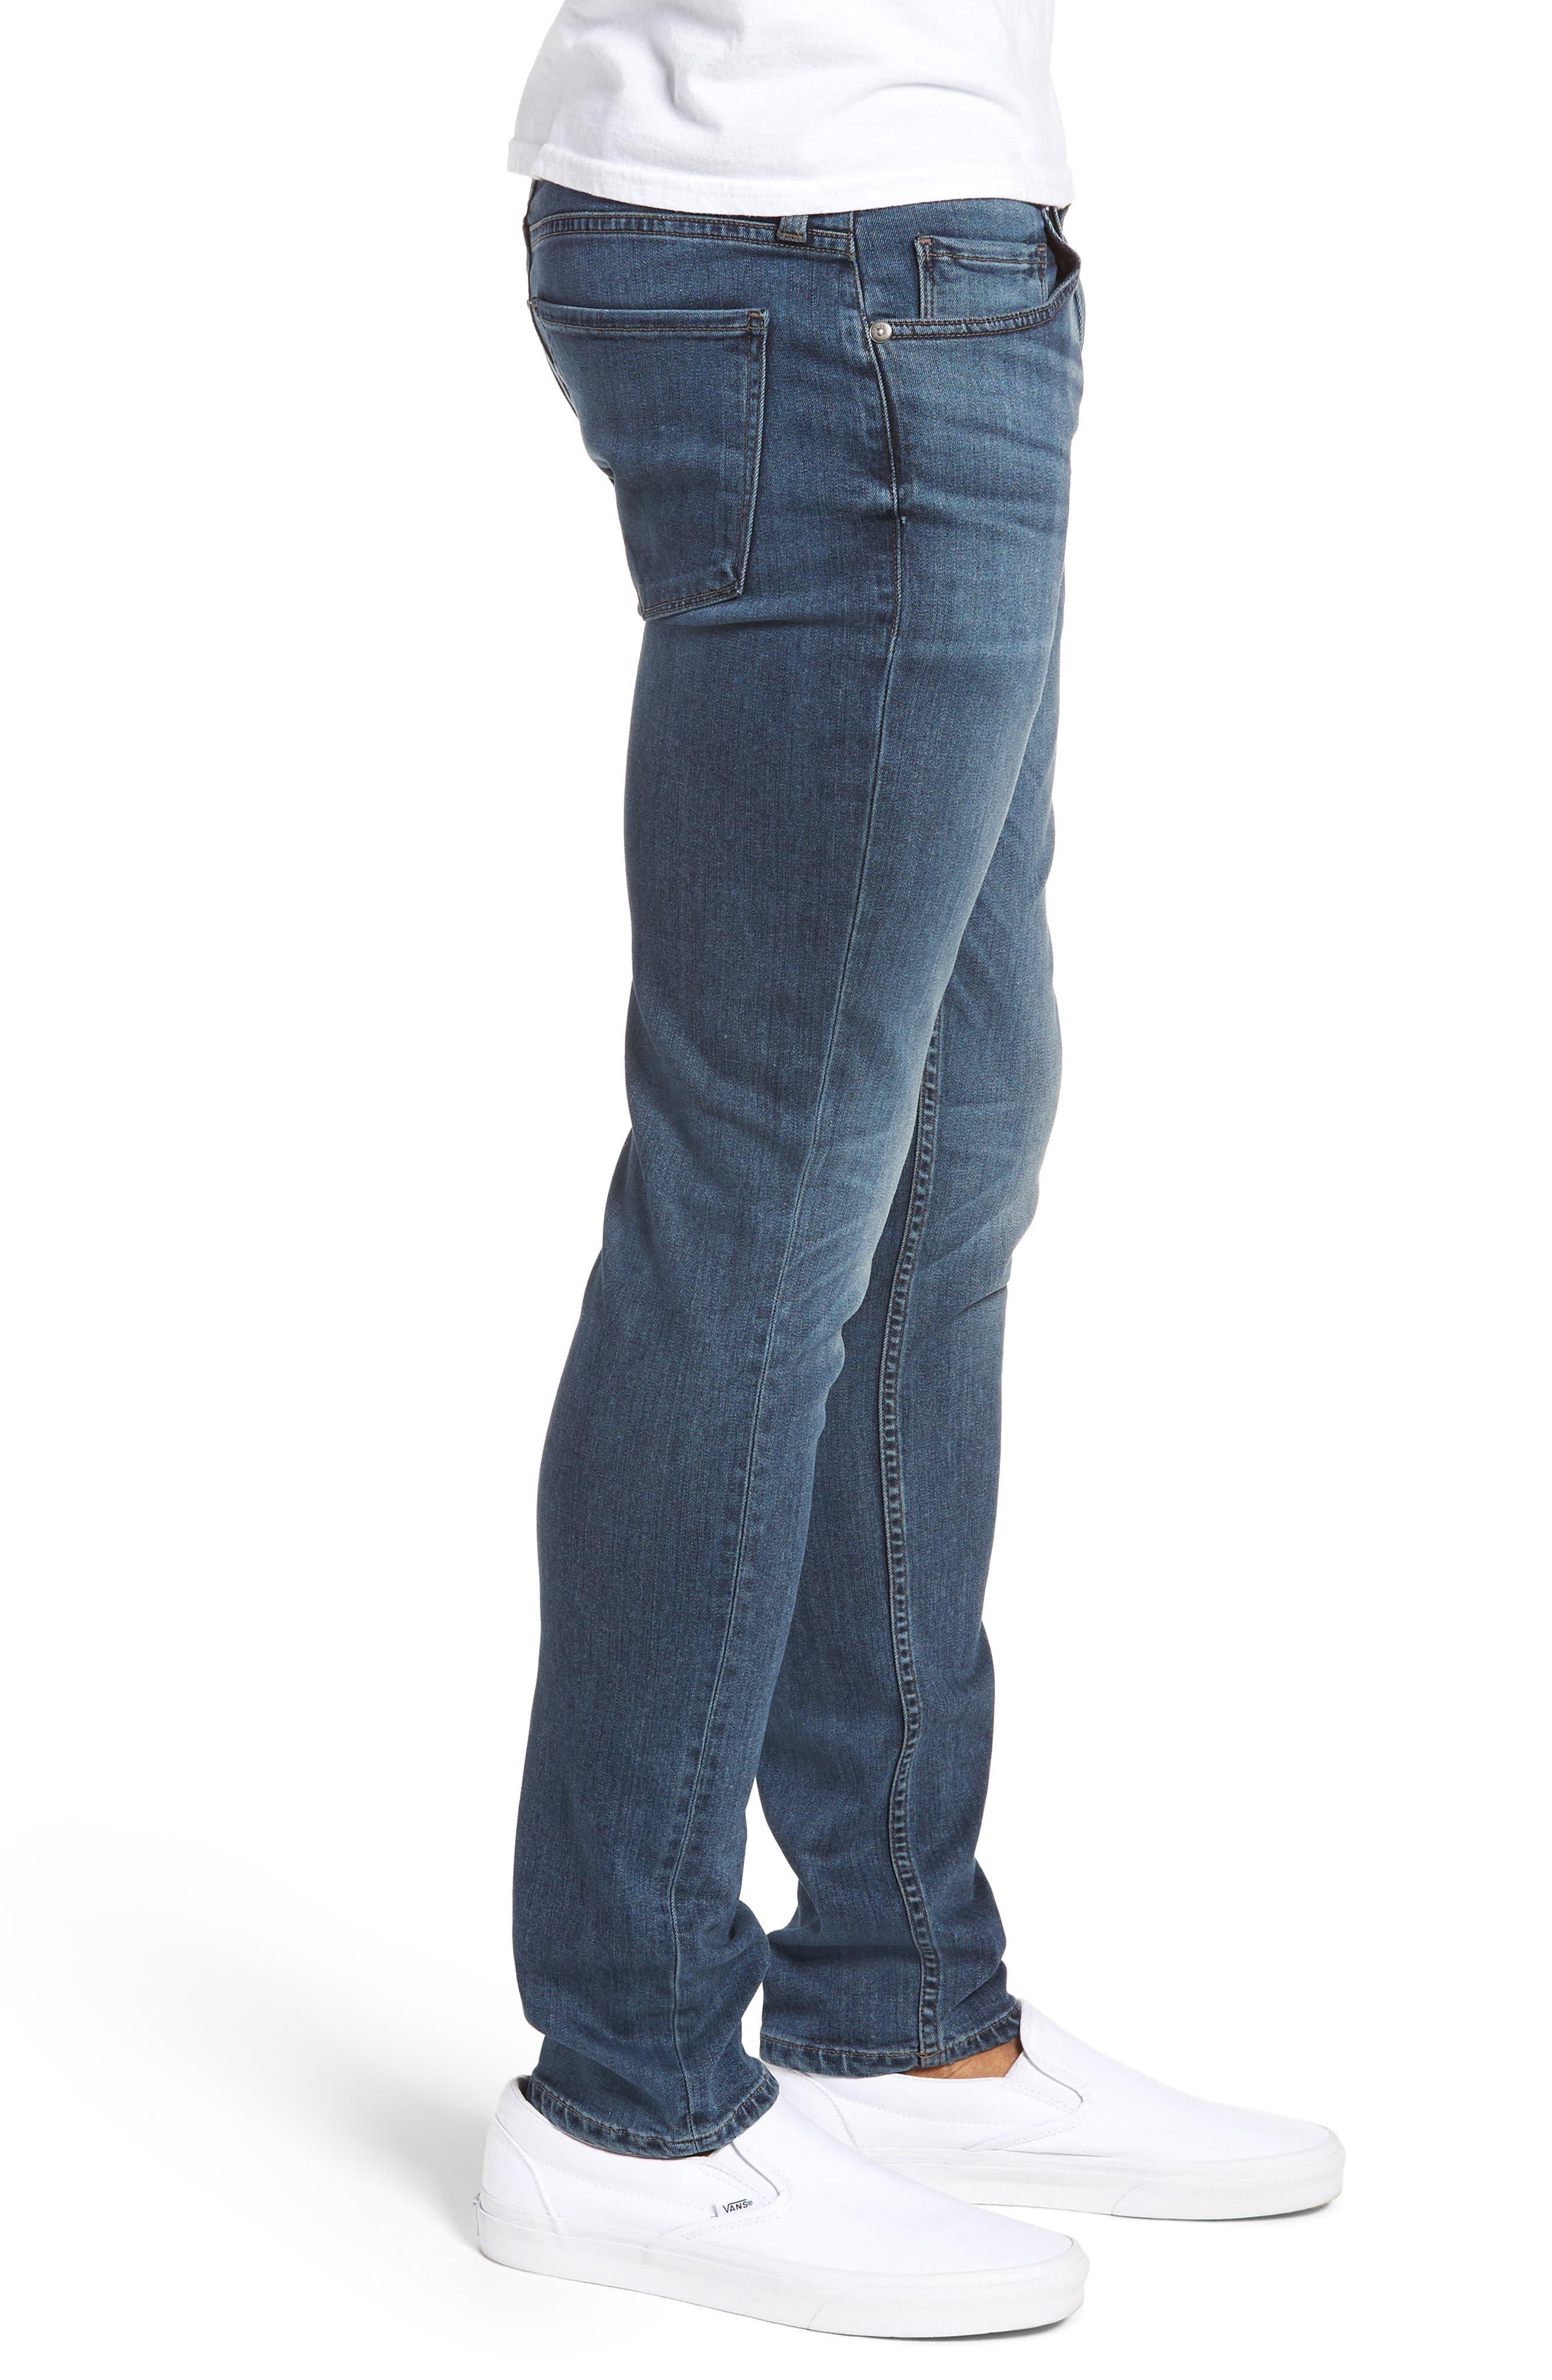 Transcend - Croft Skinny Fit Jeans,                             Alternate thumbnail 3, color,                             GRAMMERCY